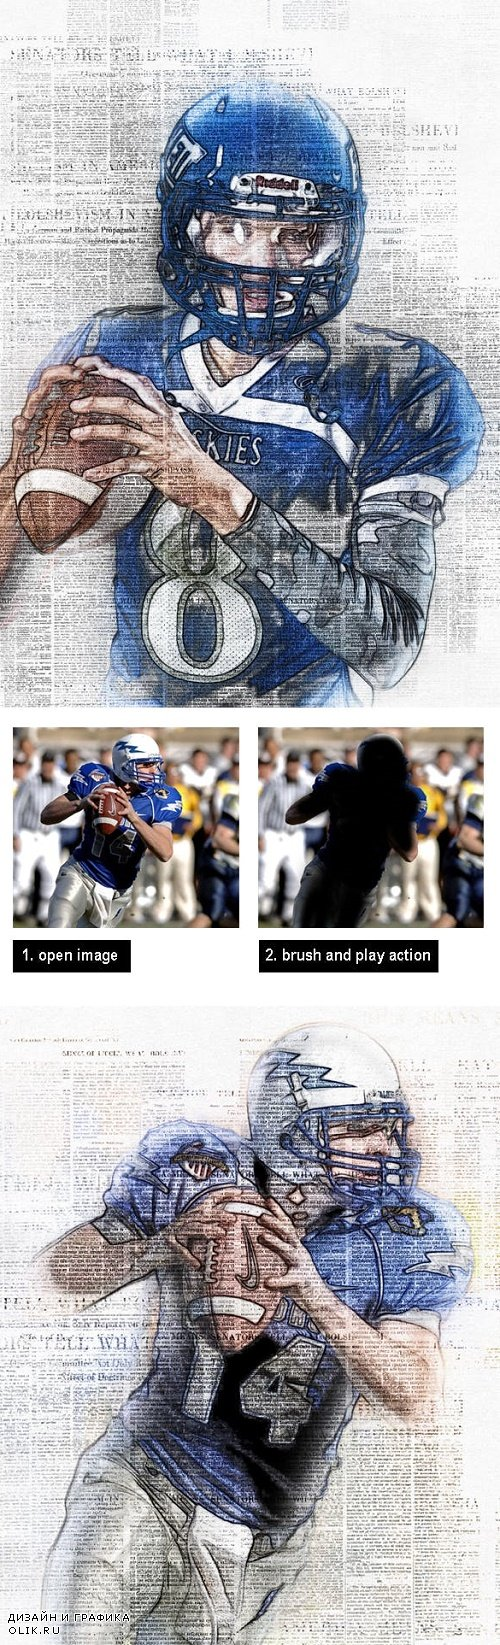 Amazing Journal Art Photoshop Action Vol 1 23629537